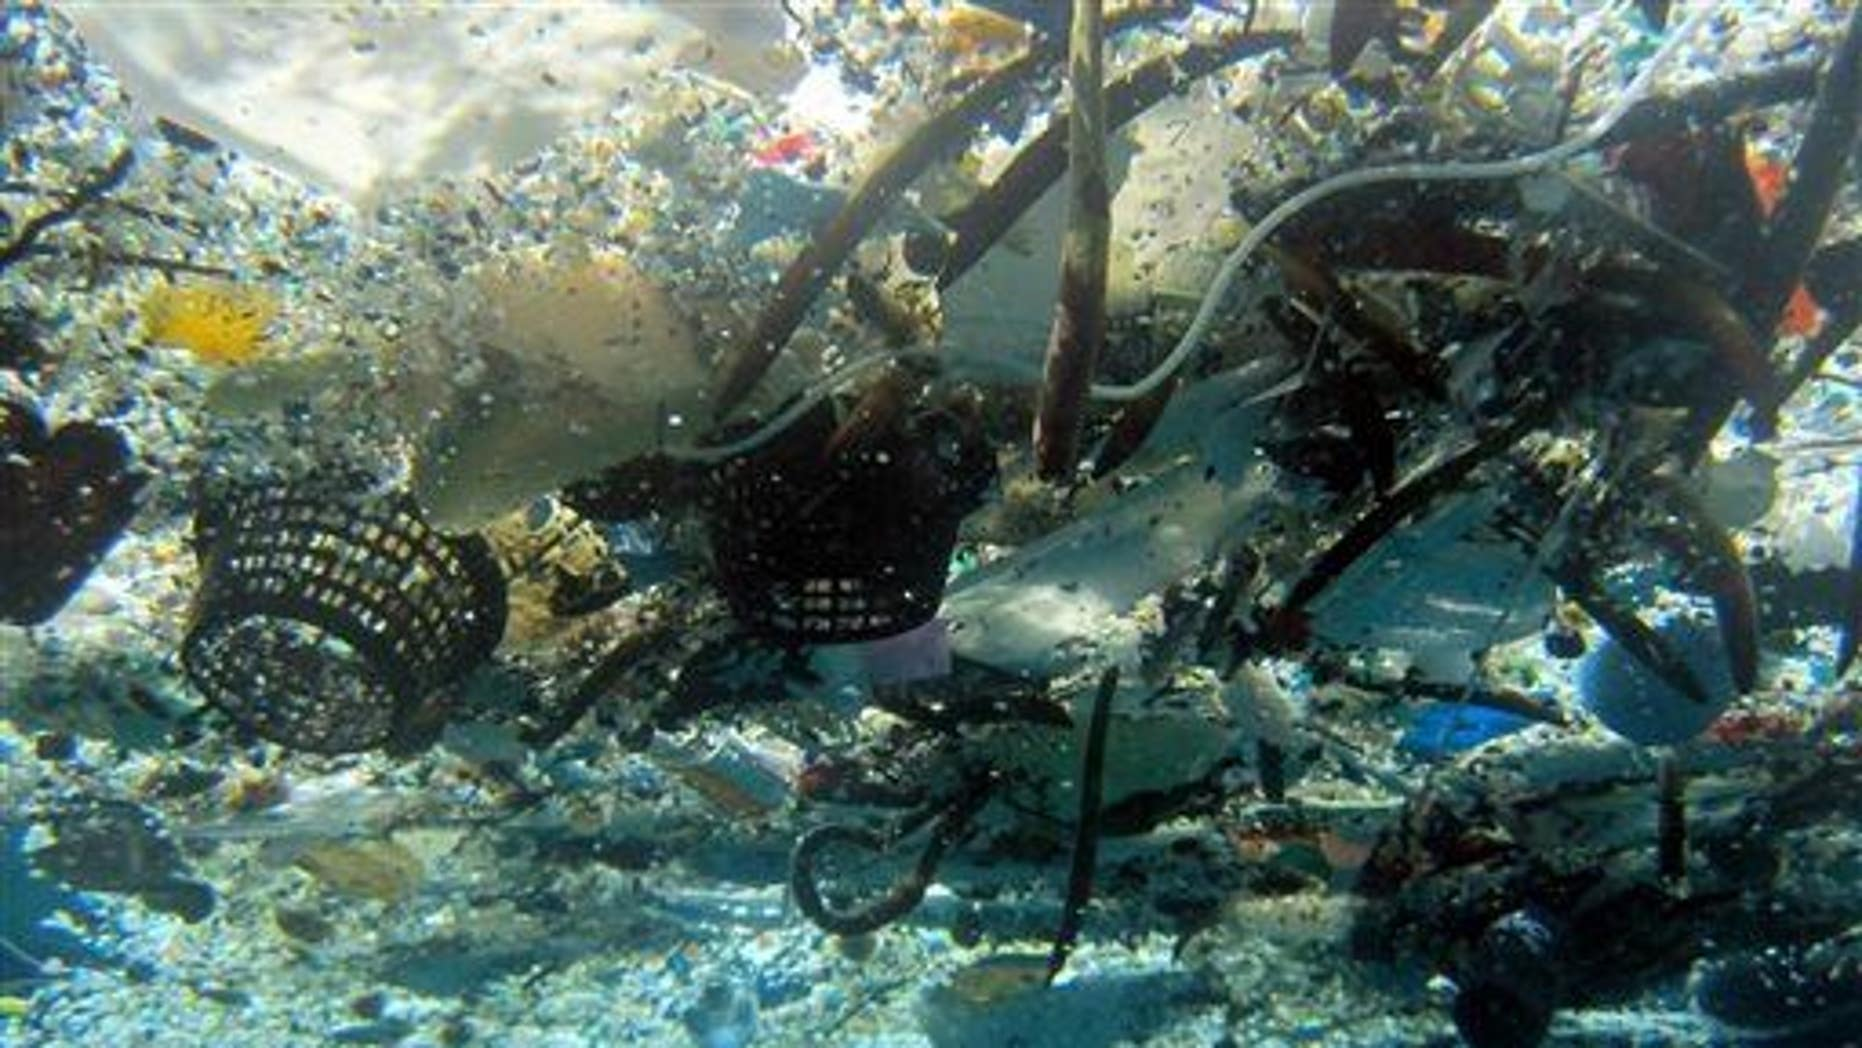 This 2008 photo shows debris in Hanauma Bay, Hawaii.